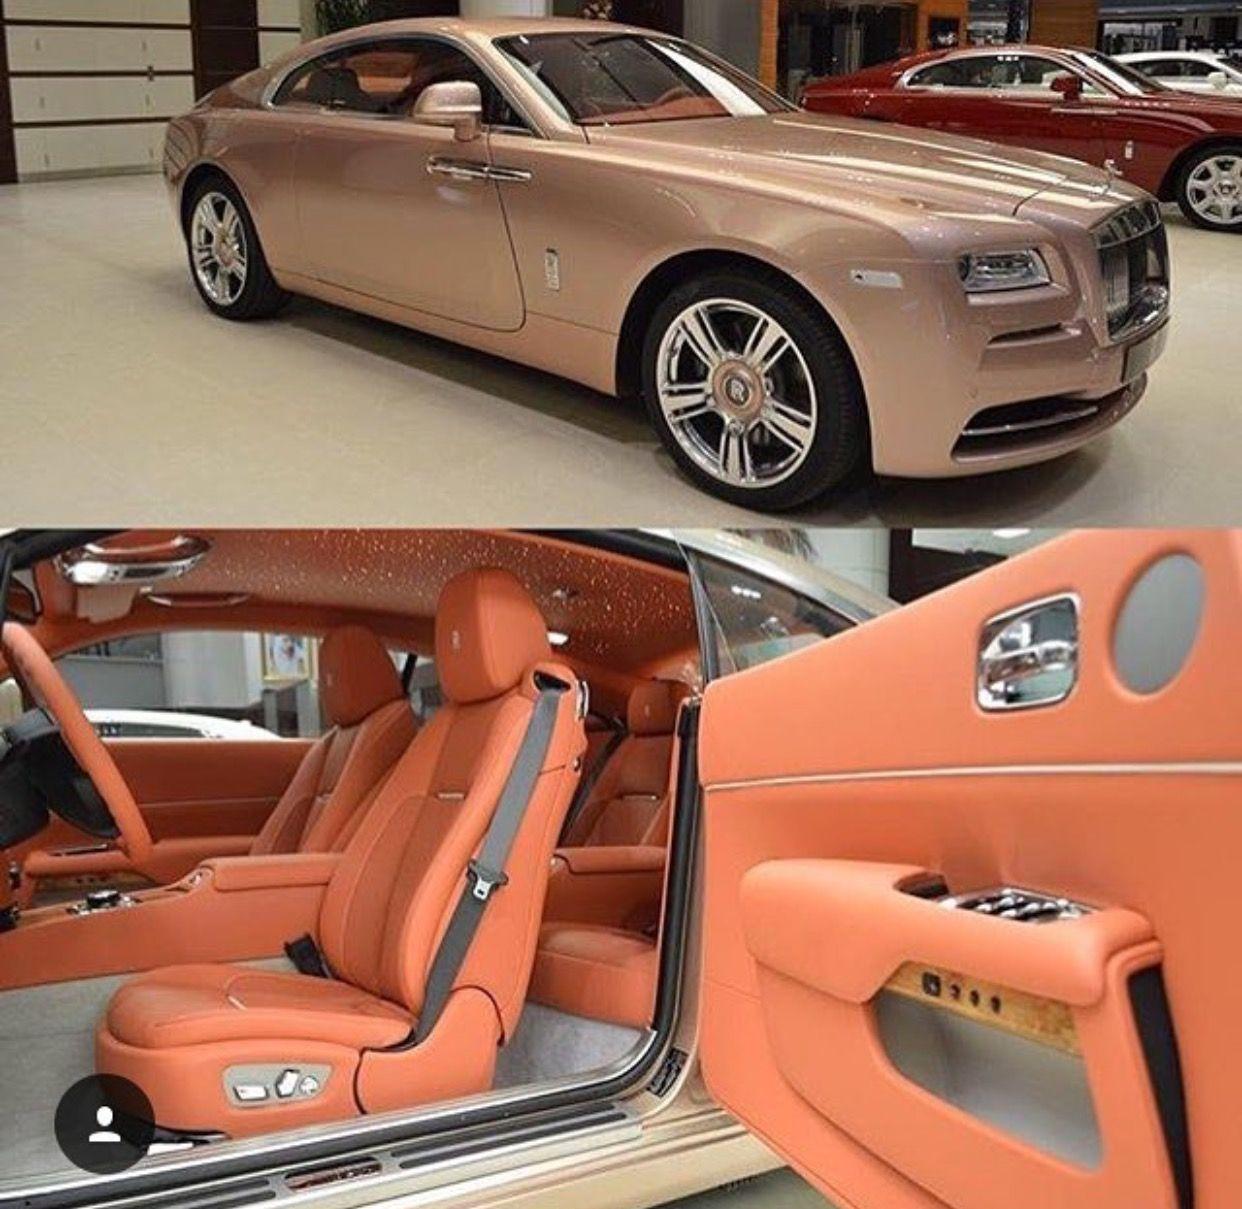 Gorgeous Custom Bentley: Rolls Royce, Royce, Cars